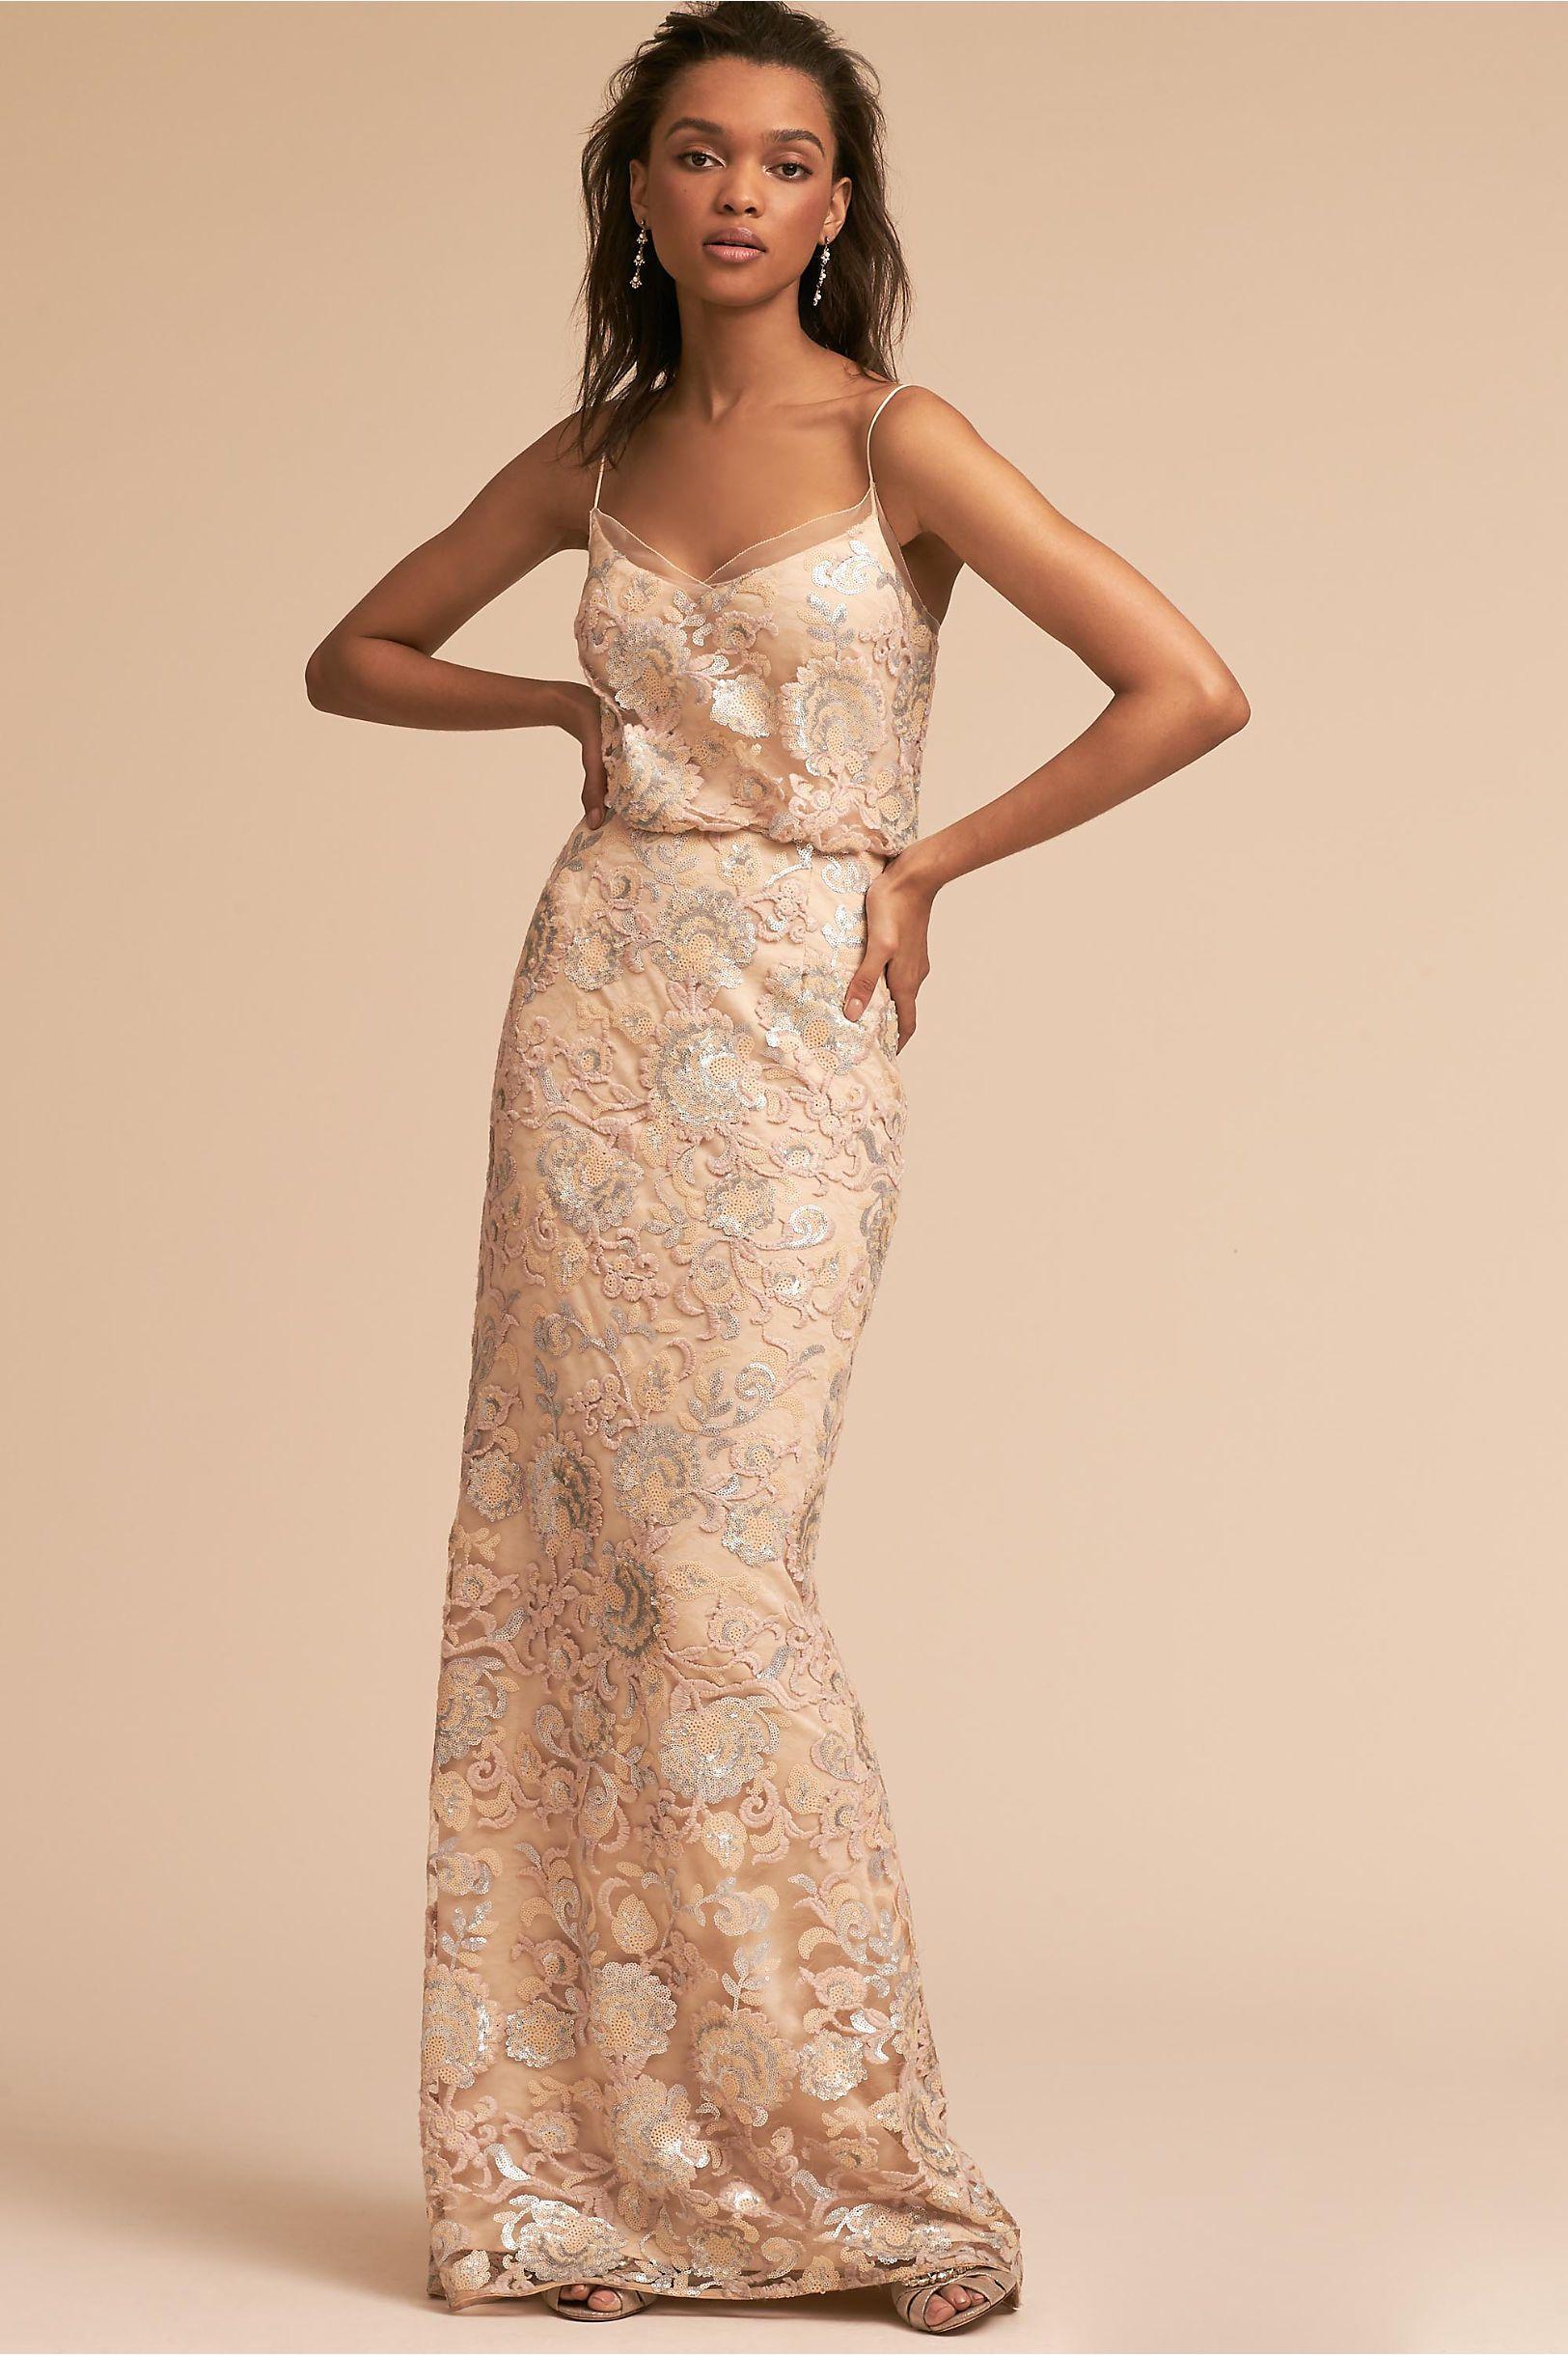 Wedding reception dresses for bride  BHLDNus Adrianna Papell Kylie Dress in Almond  Products  Pinterest